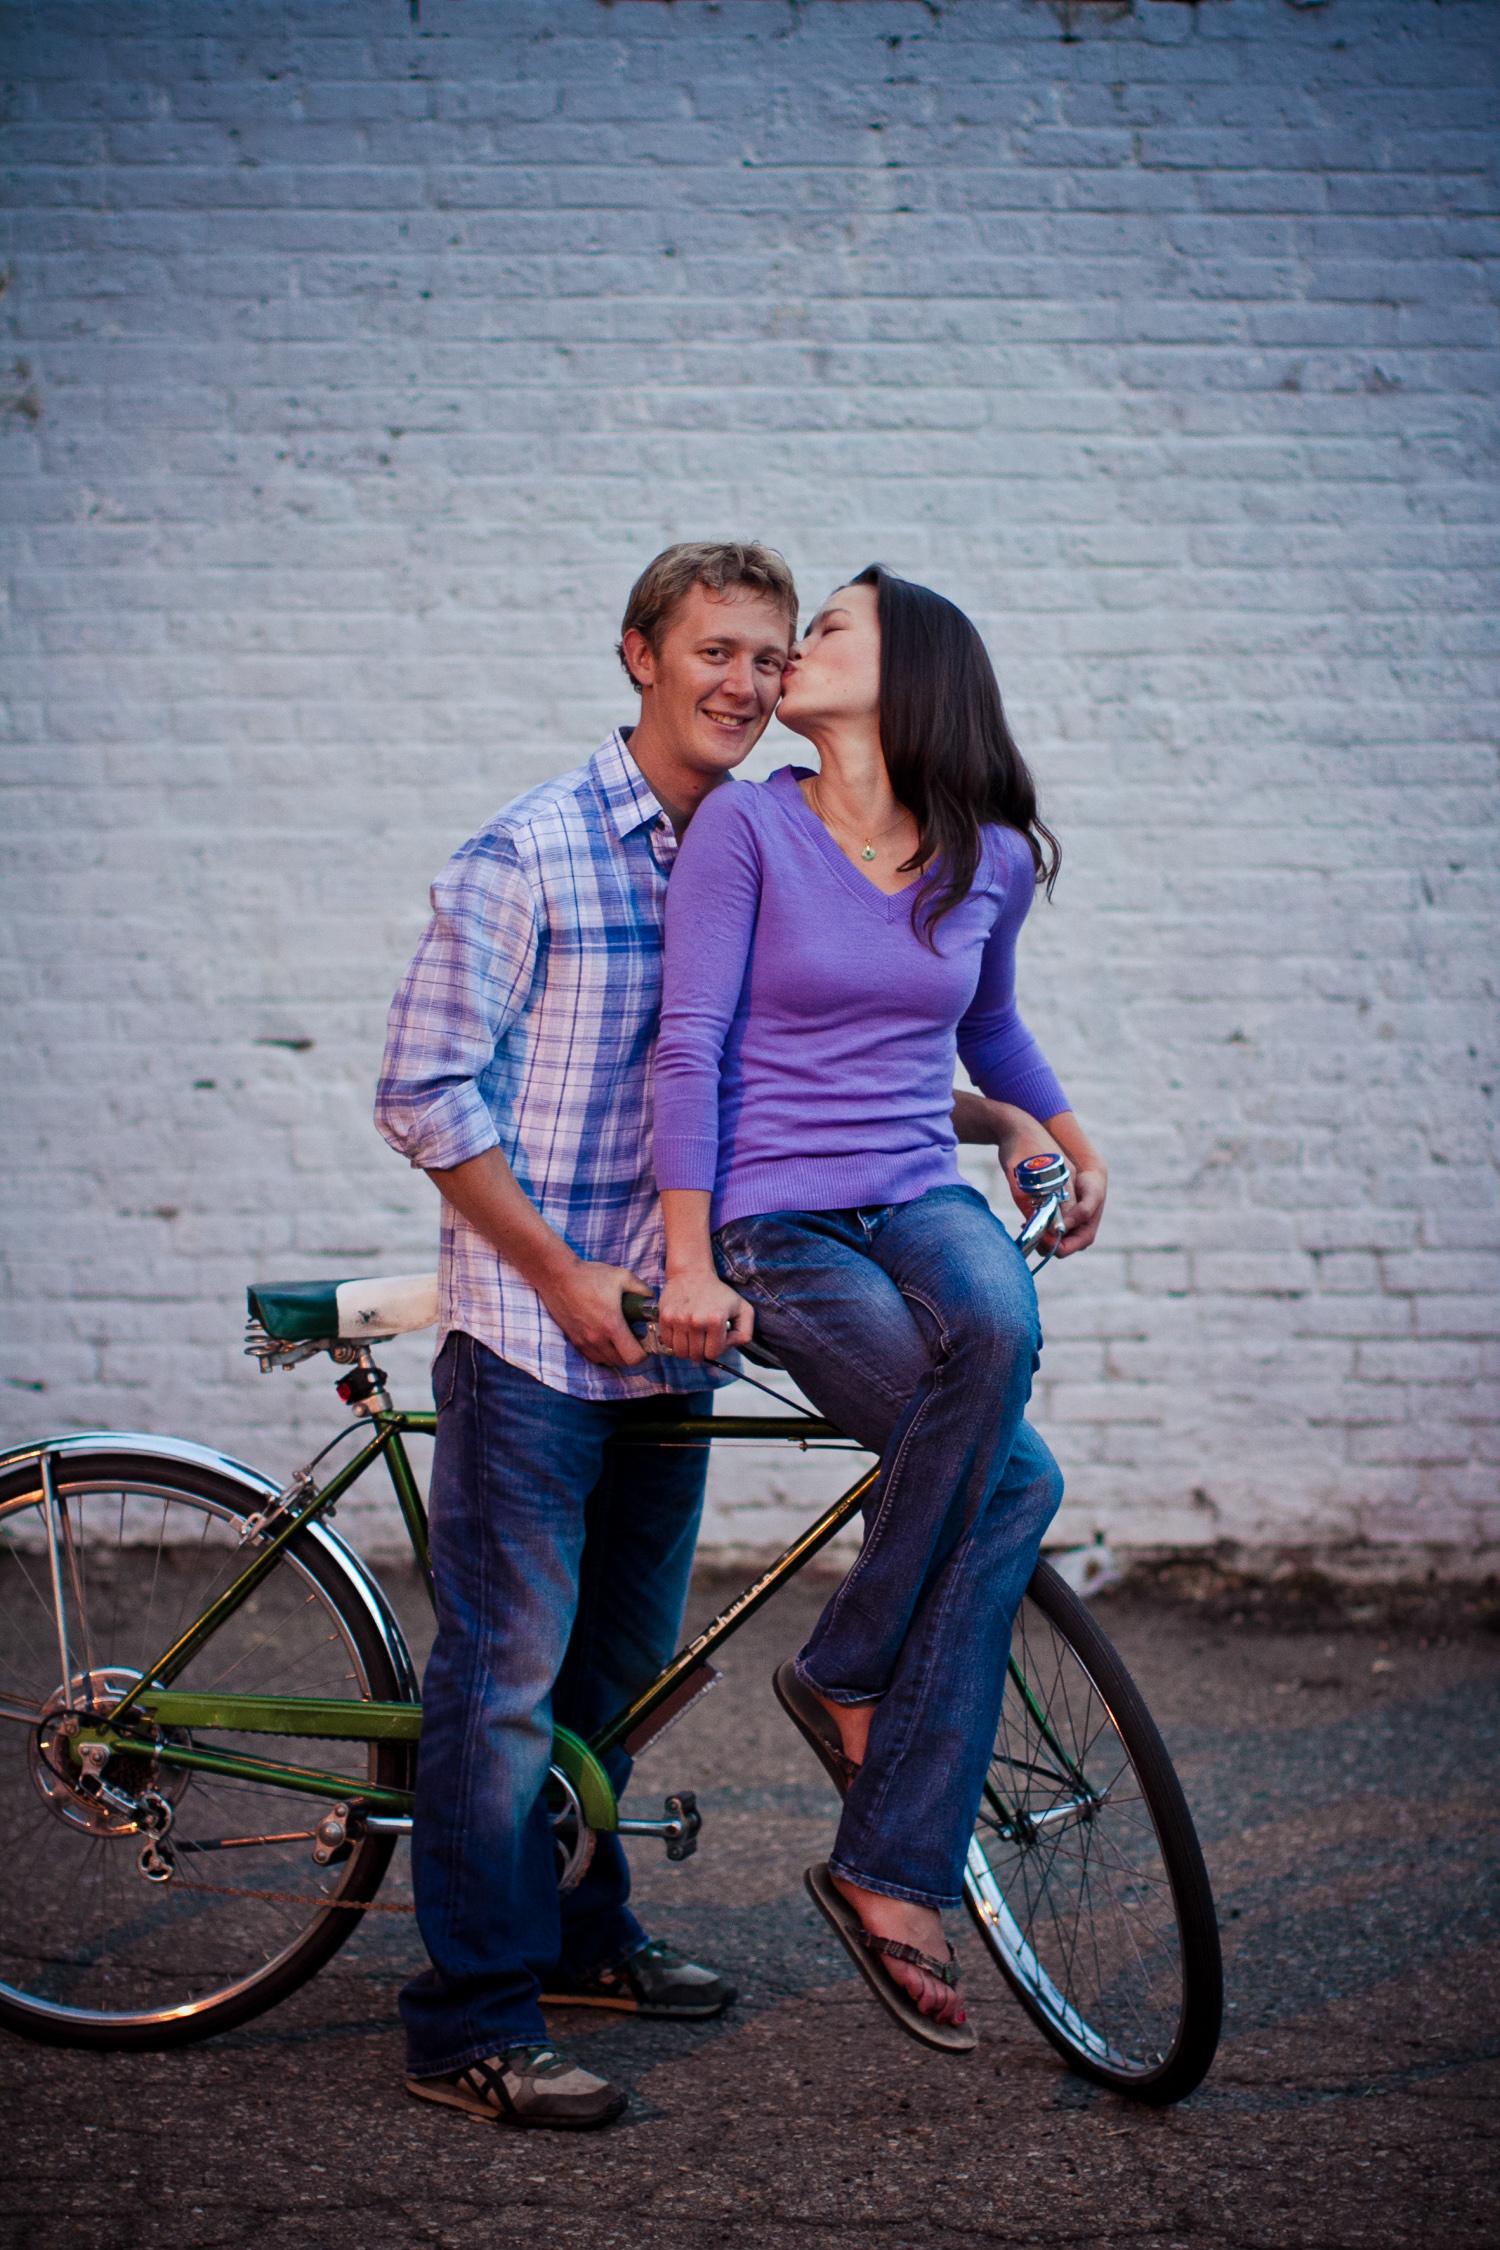 LoDo_Denver_Engagement_Photos_036.JPG